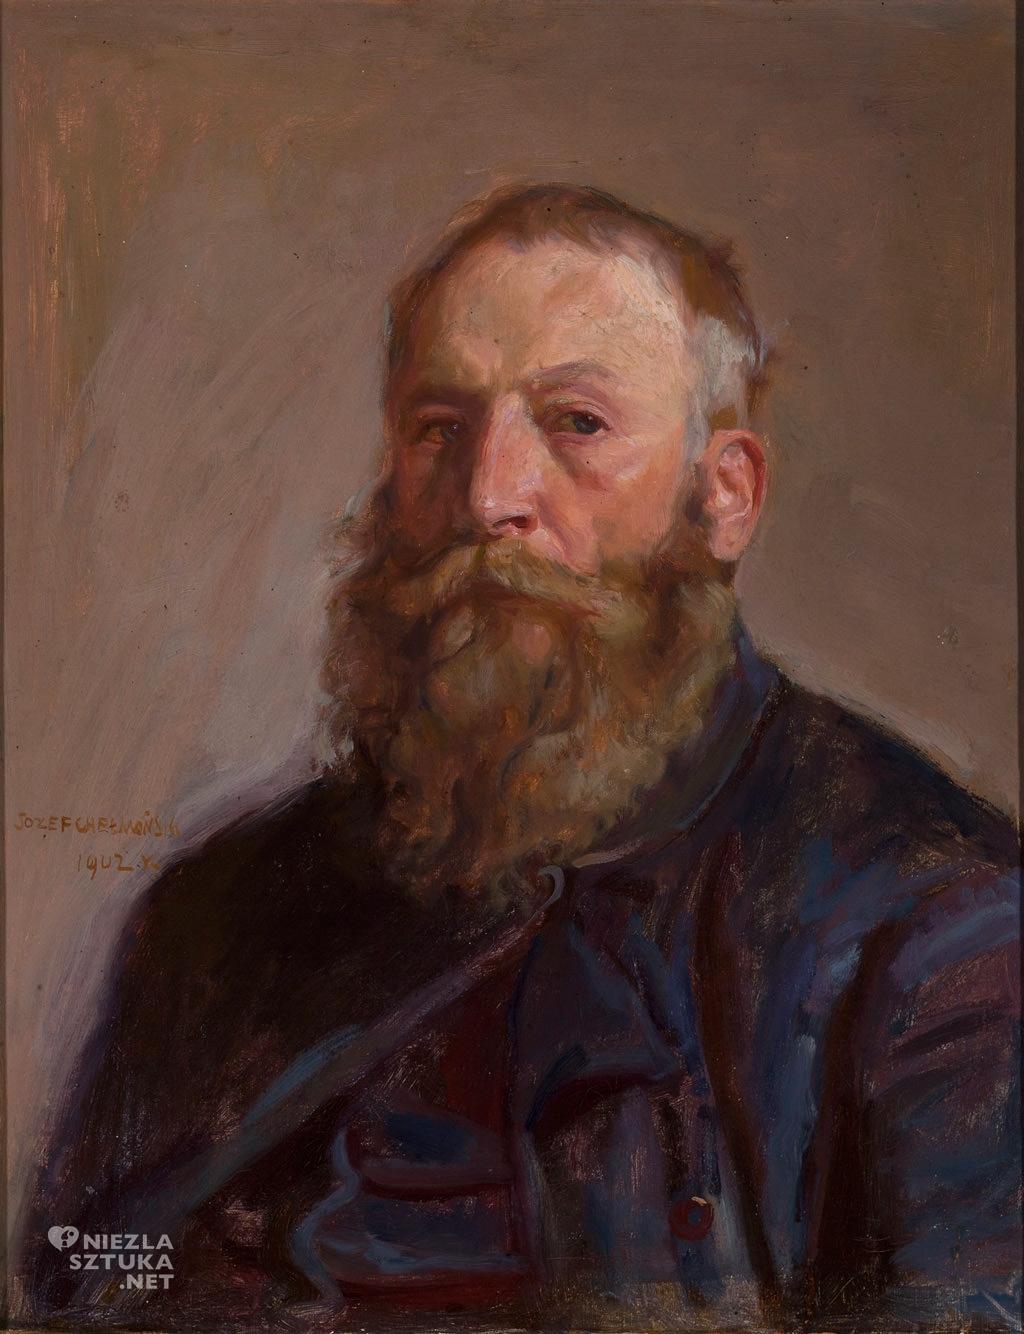 Józef Chełmoński, Autoportret, artysta polski, sztuka polska, Niezła sztuka